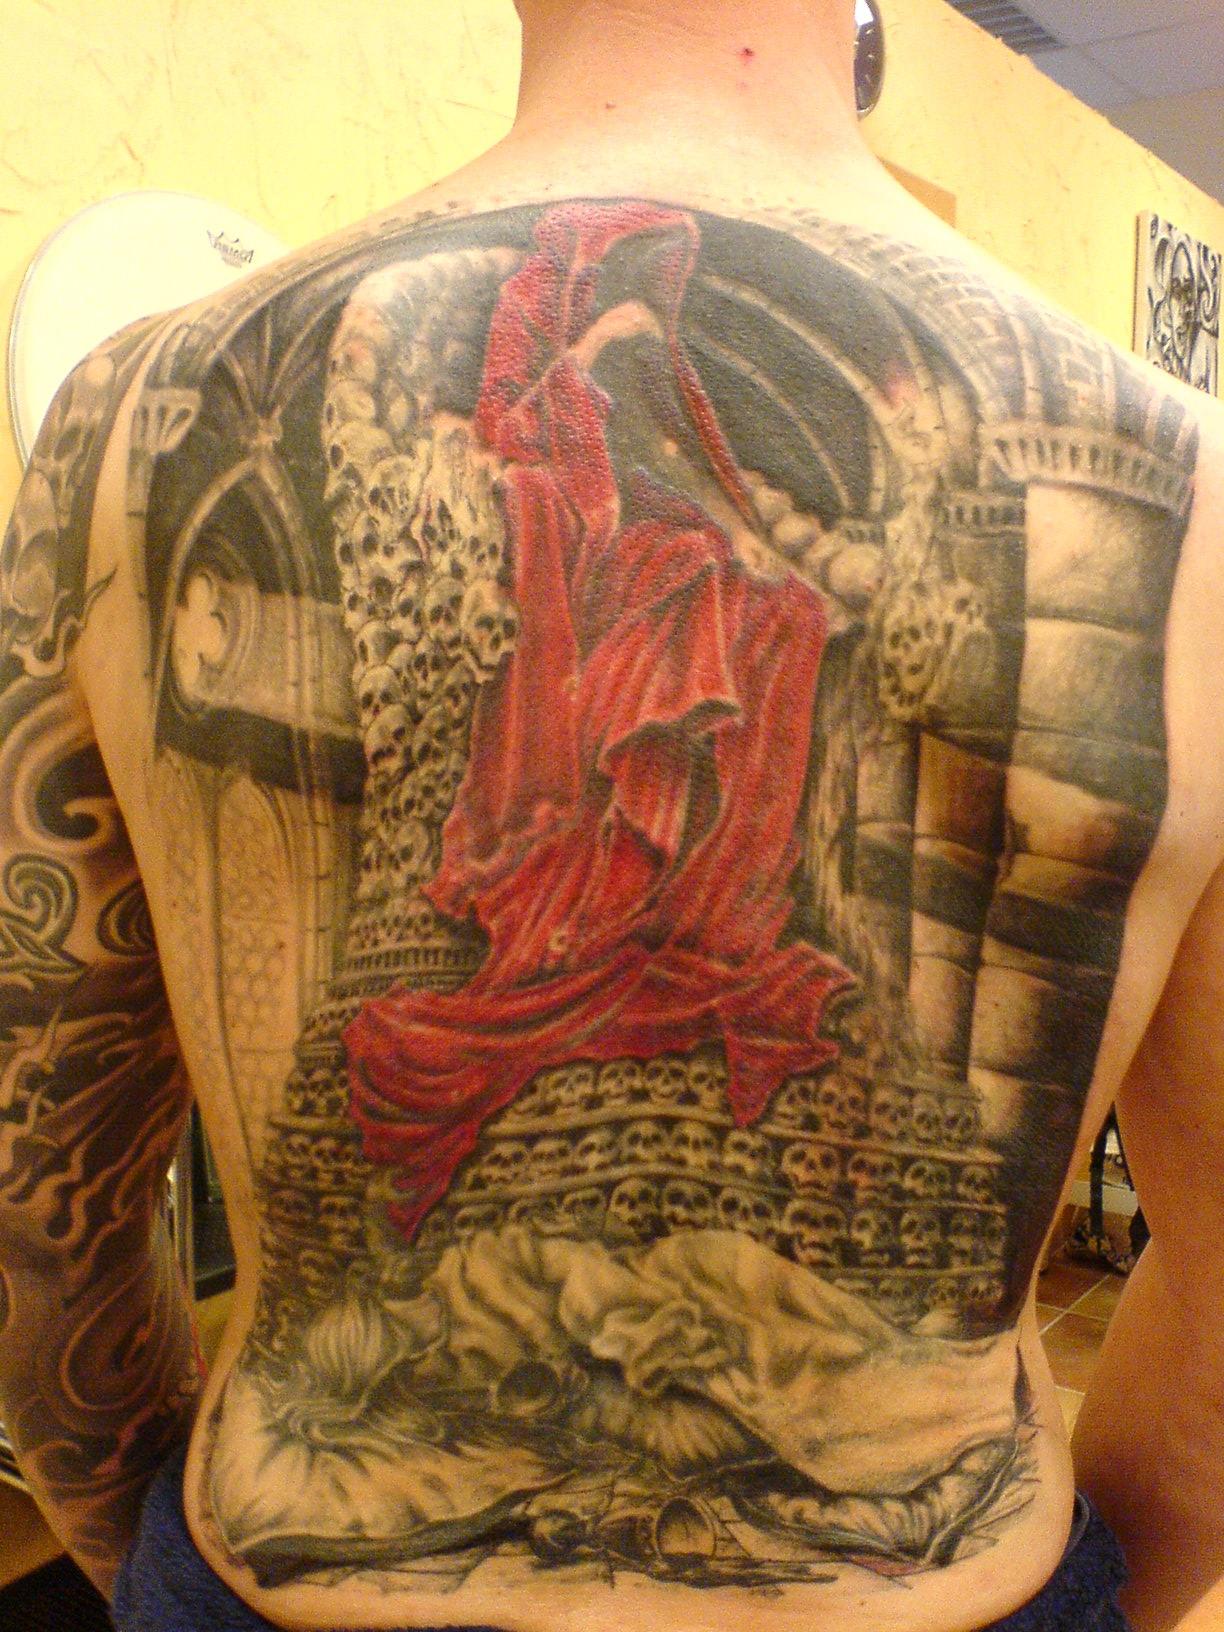 Oy Dark Tower Tattoos